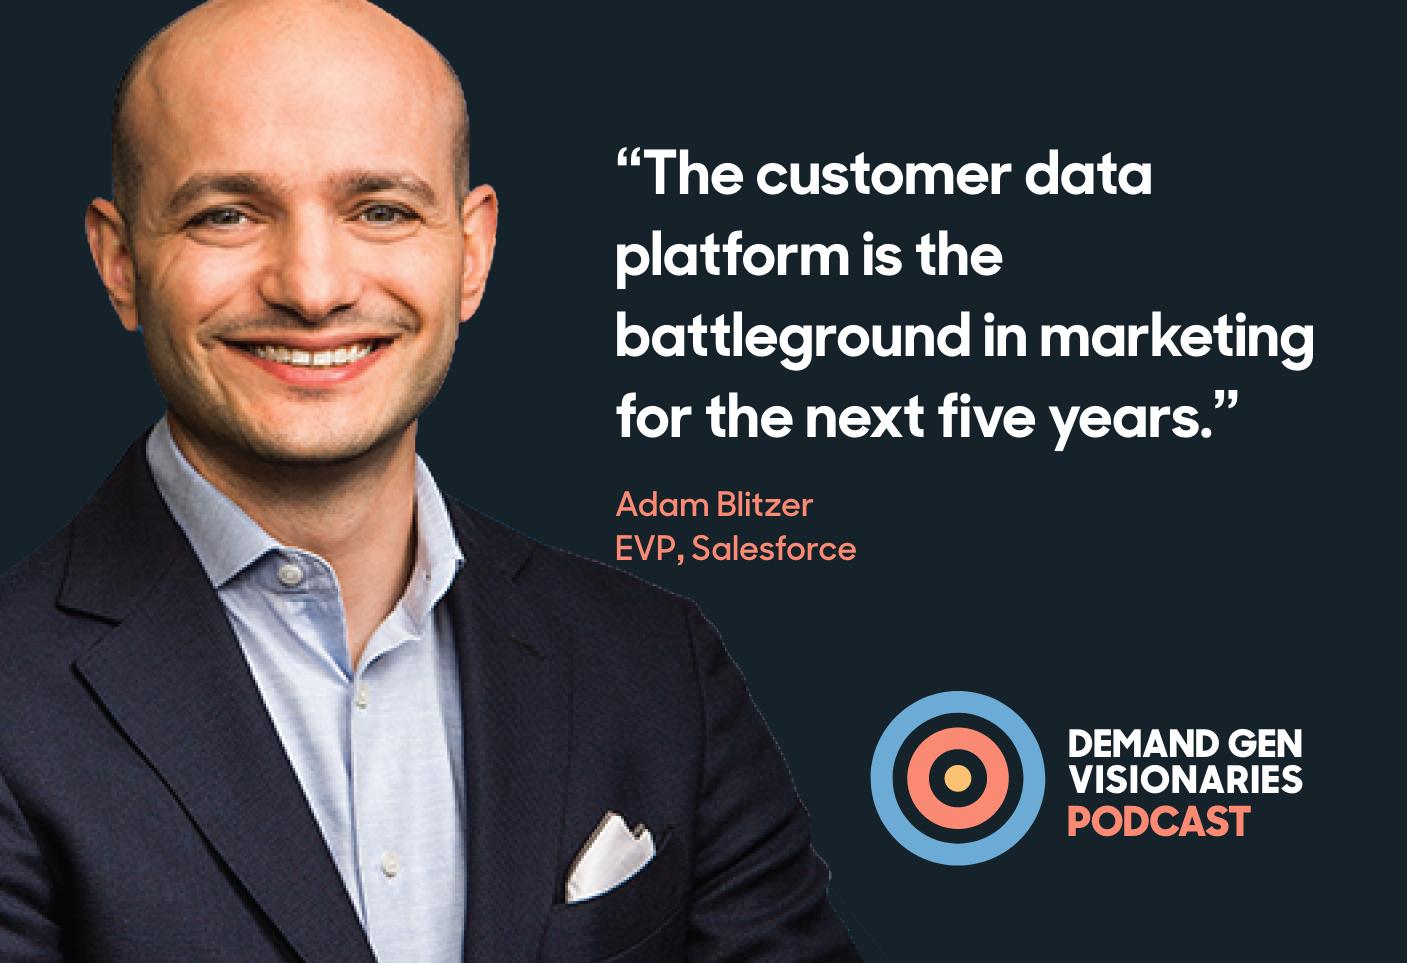 Adam Blitzer, EVP of Salesforce joins the Qualified.com Demand Gen Visionaries Podcast